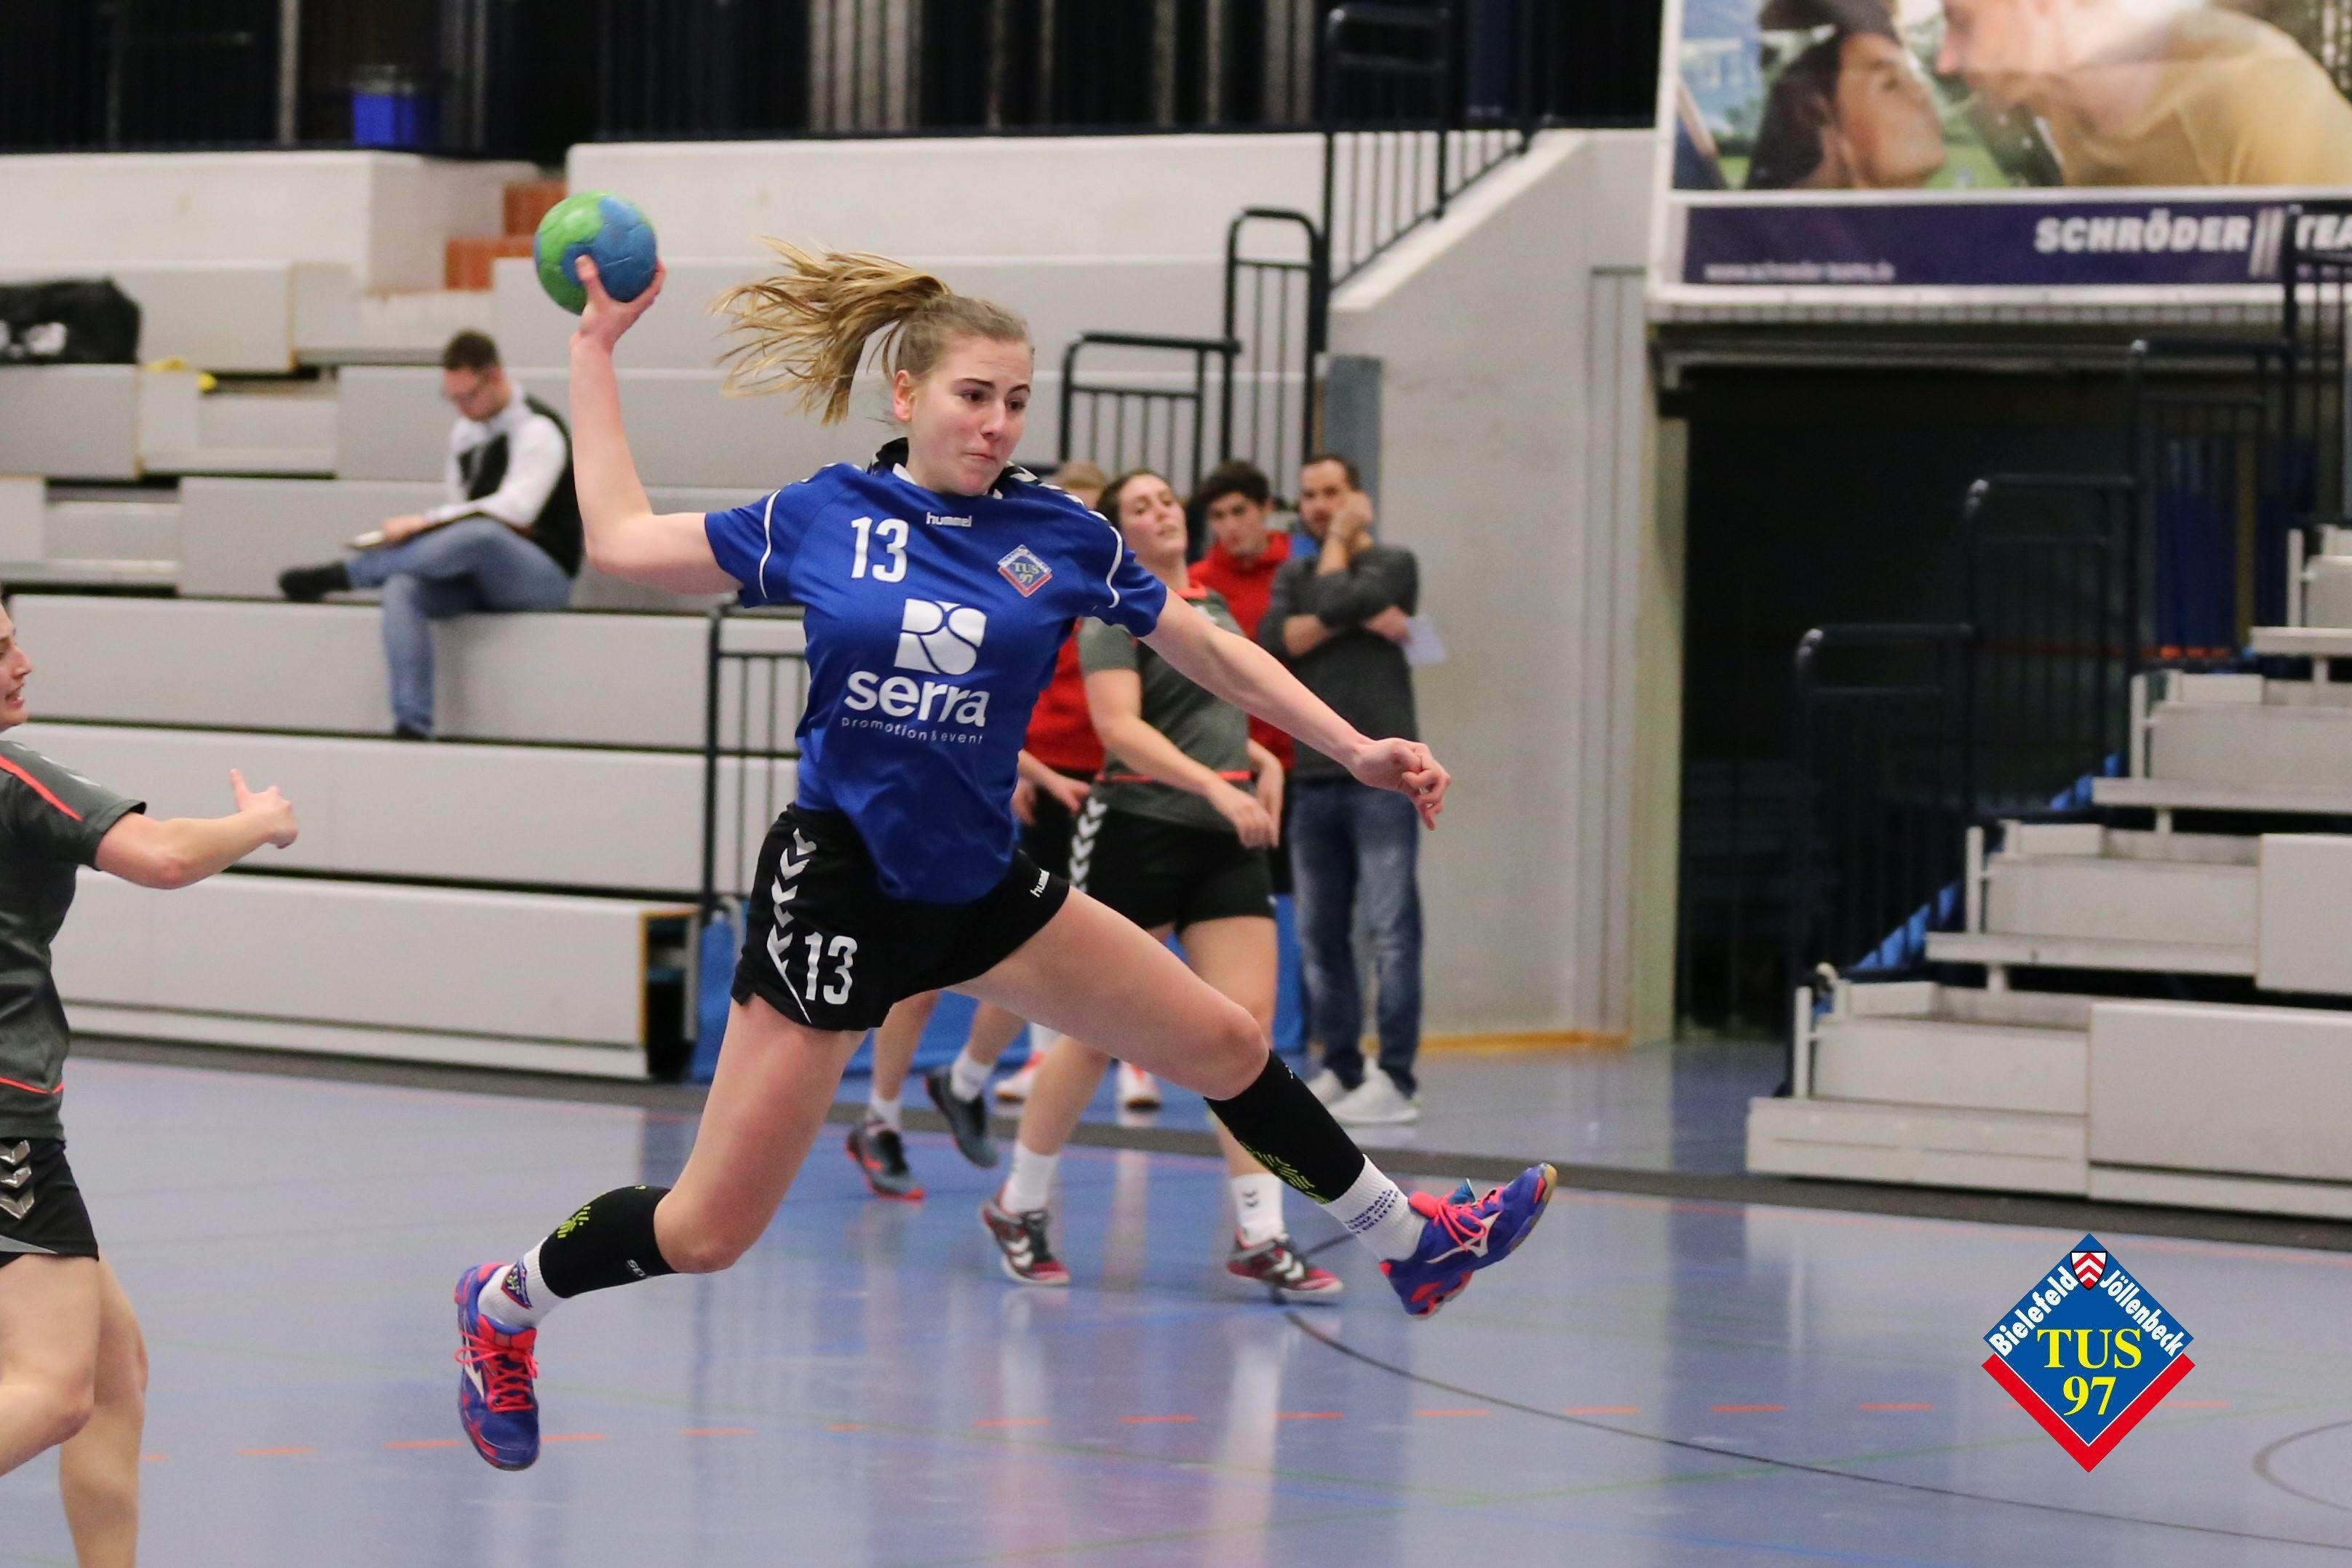 Johanna Lissel 2